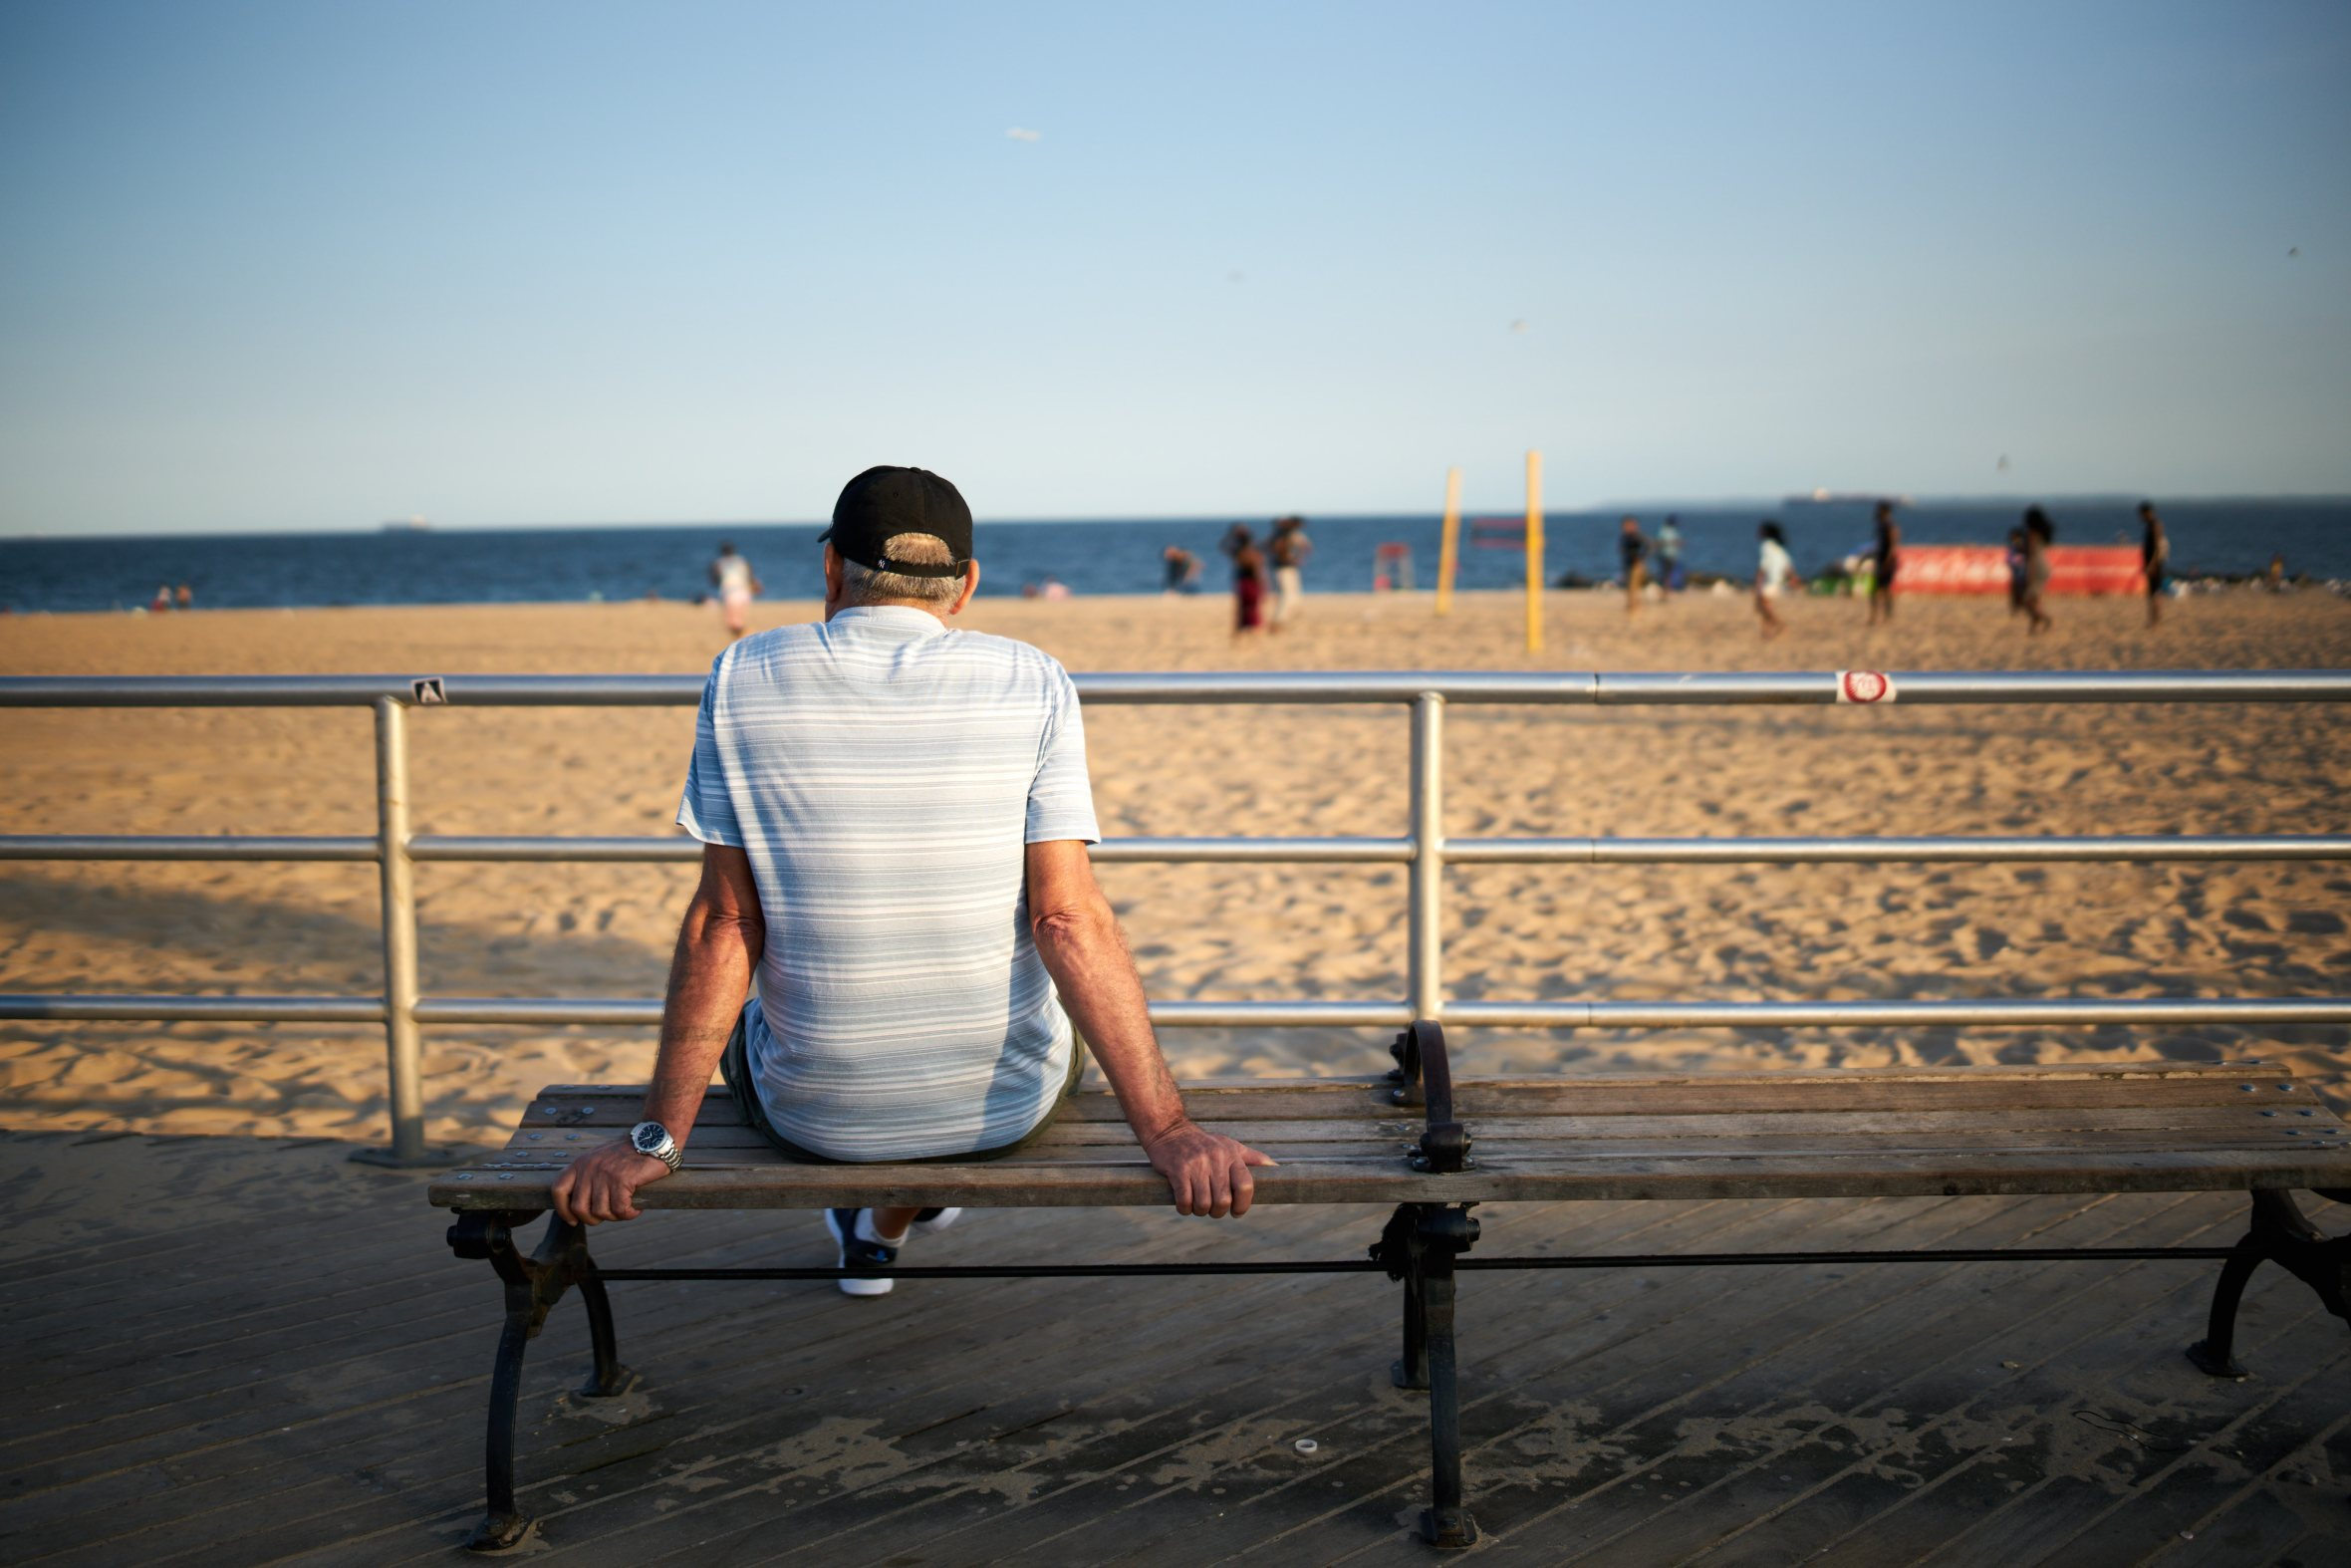 Man at Coney Island